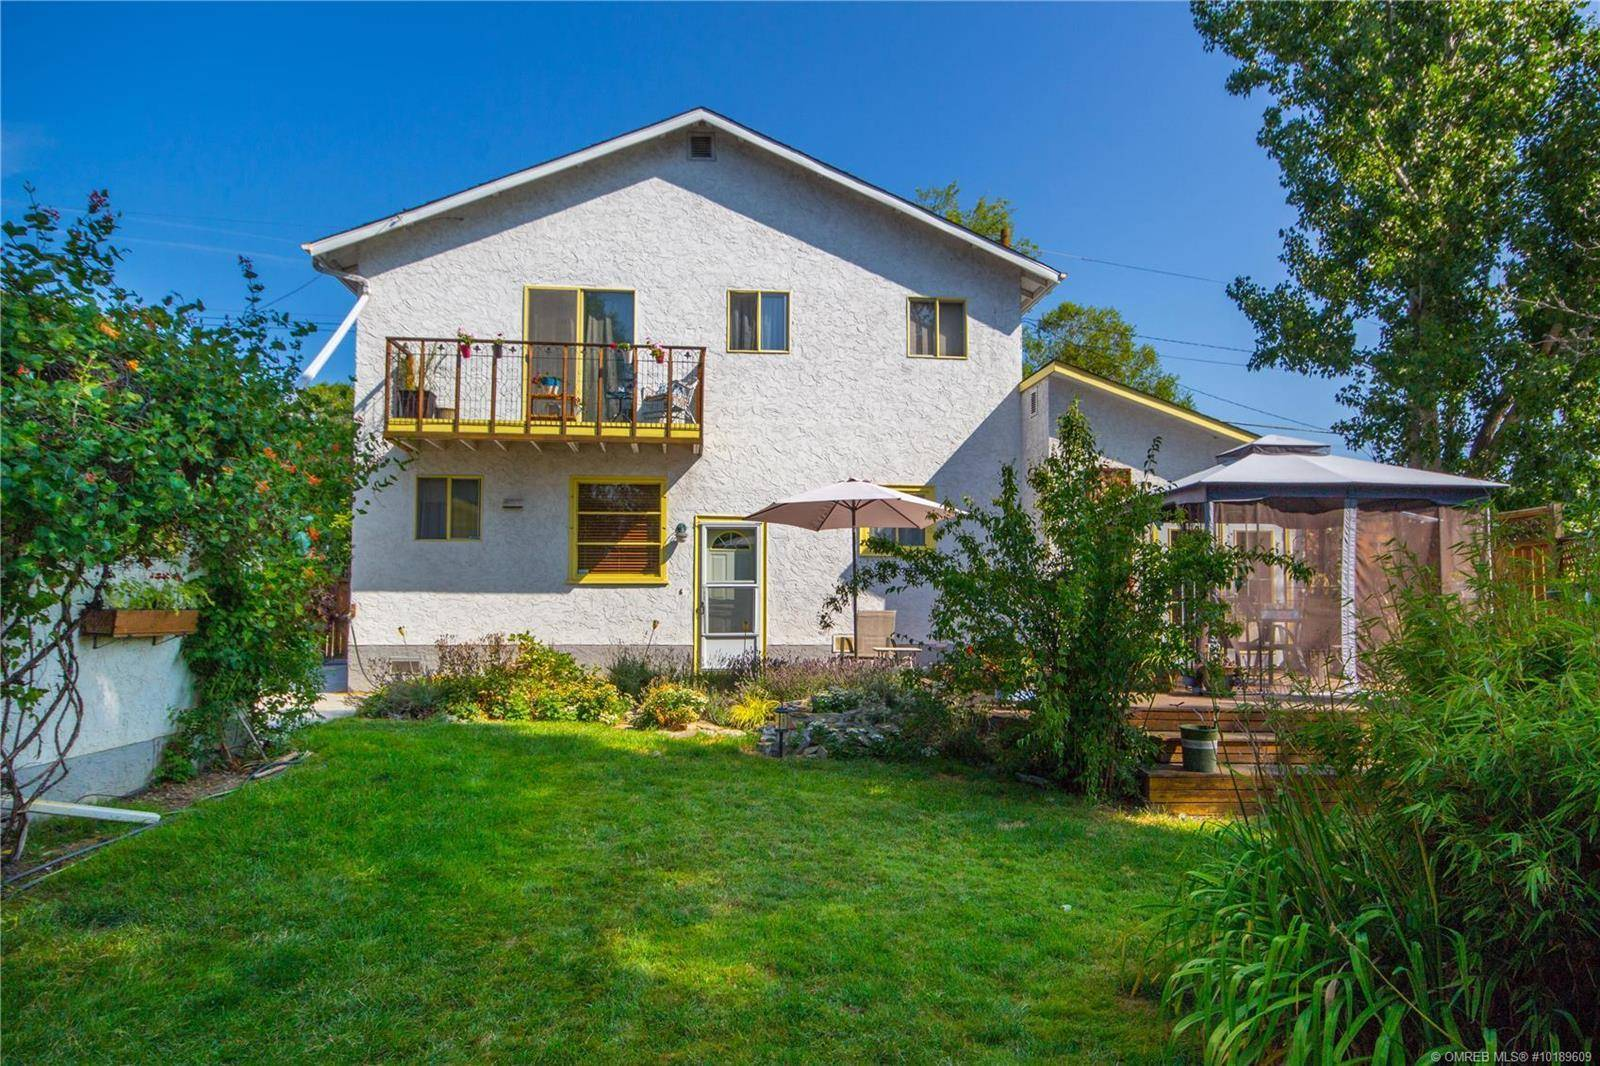 House for sale at 857 Burne Ave Kelowna British Columbia - MLS: 10189609